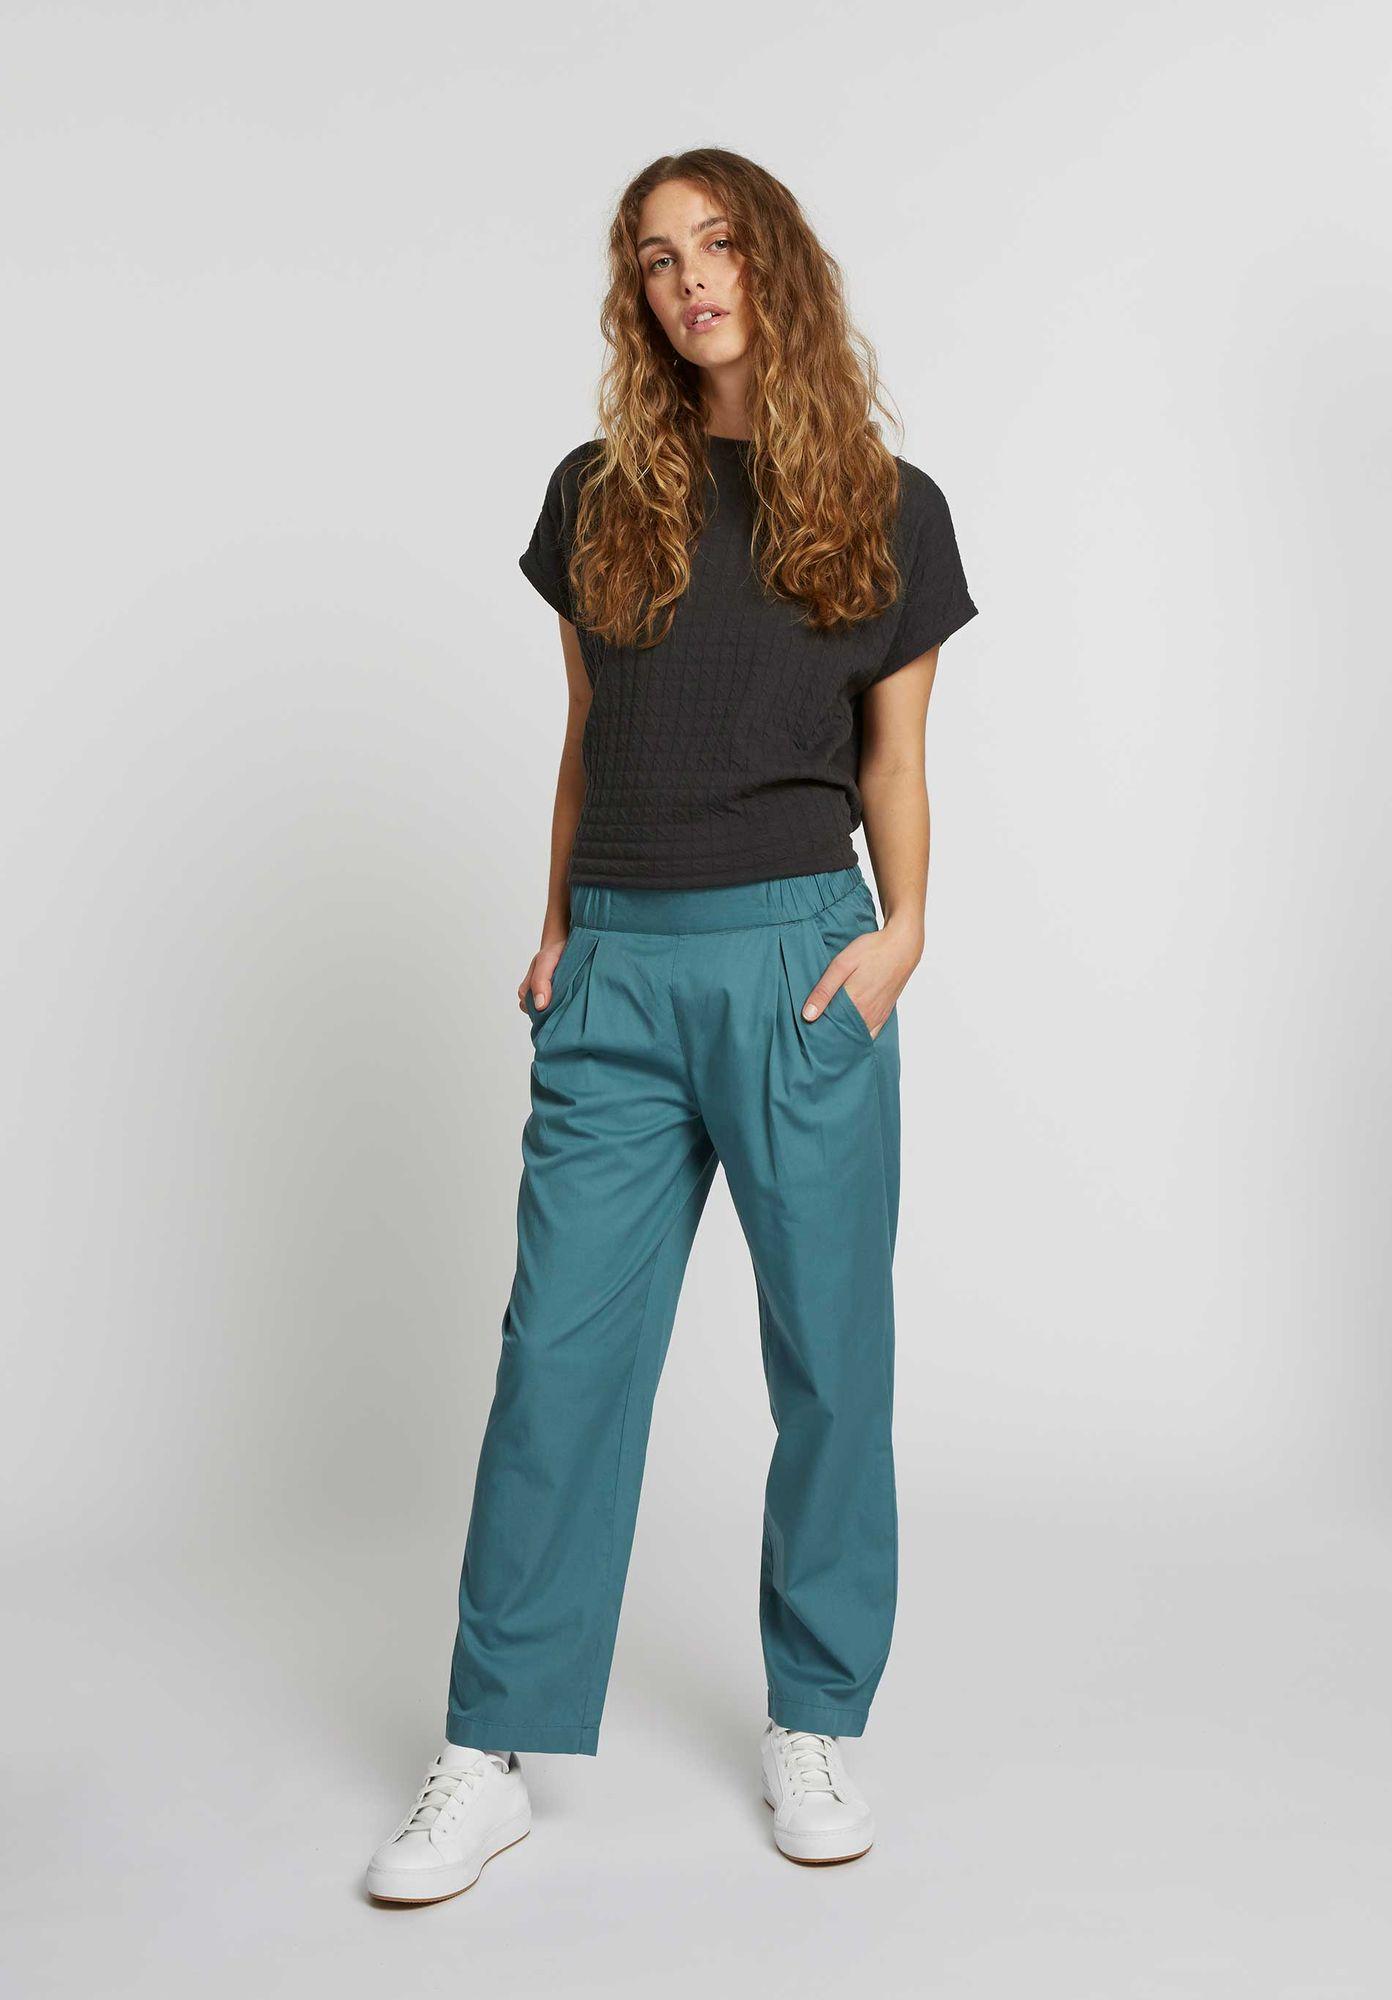 TT66 Pleat Pants